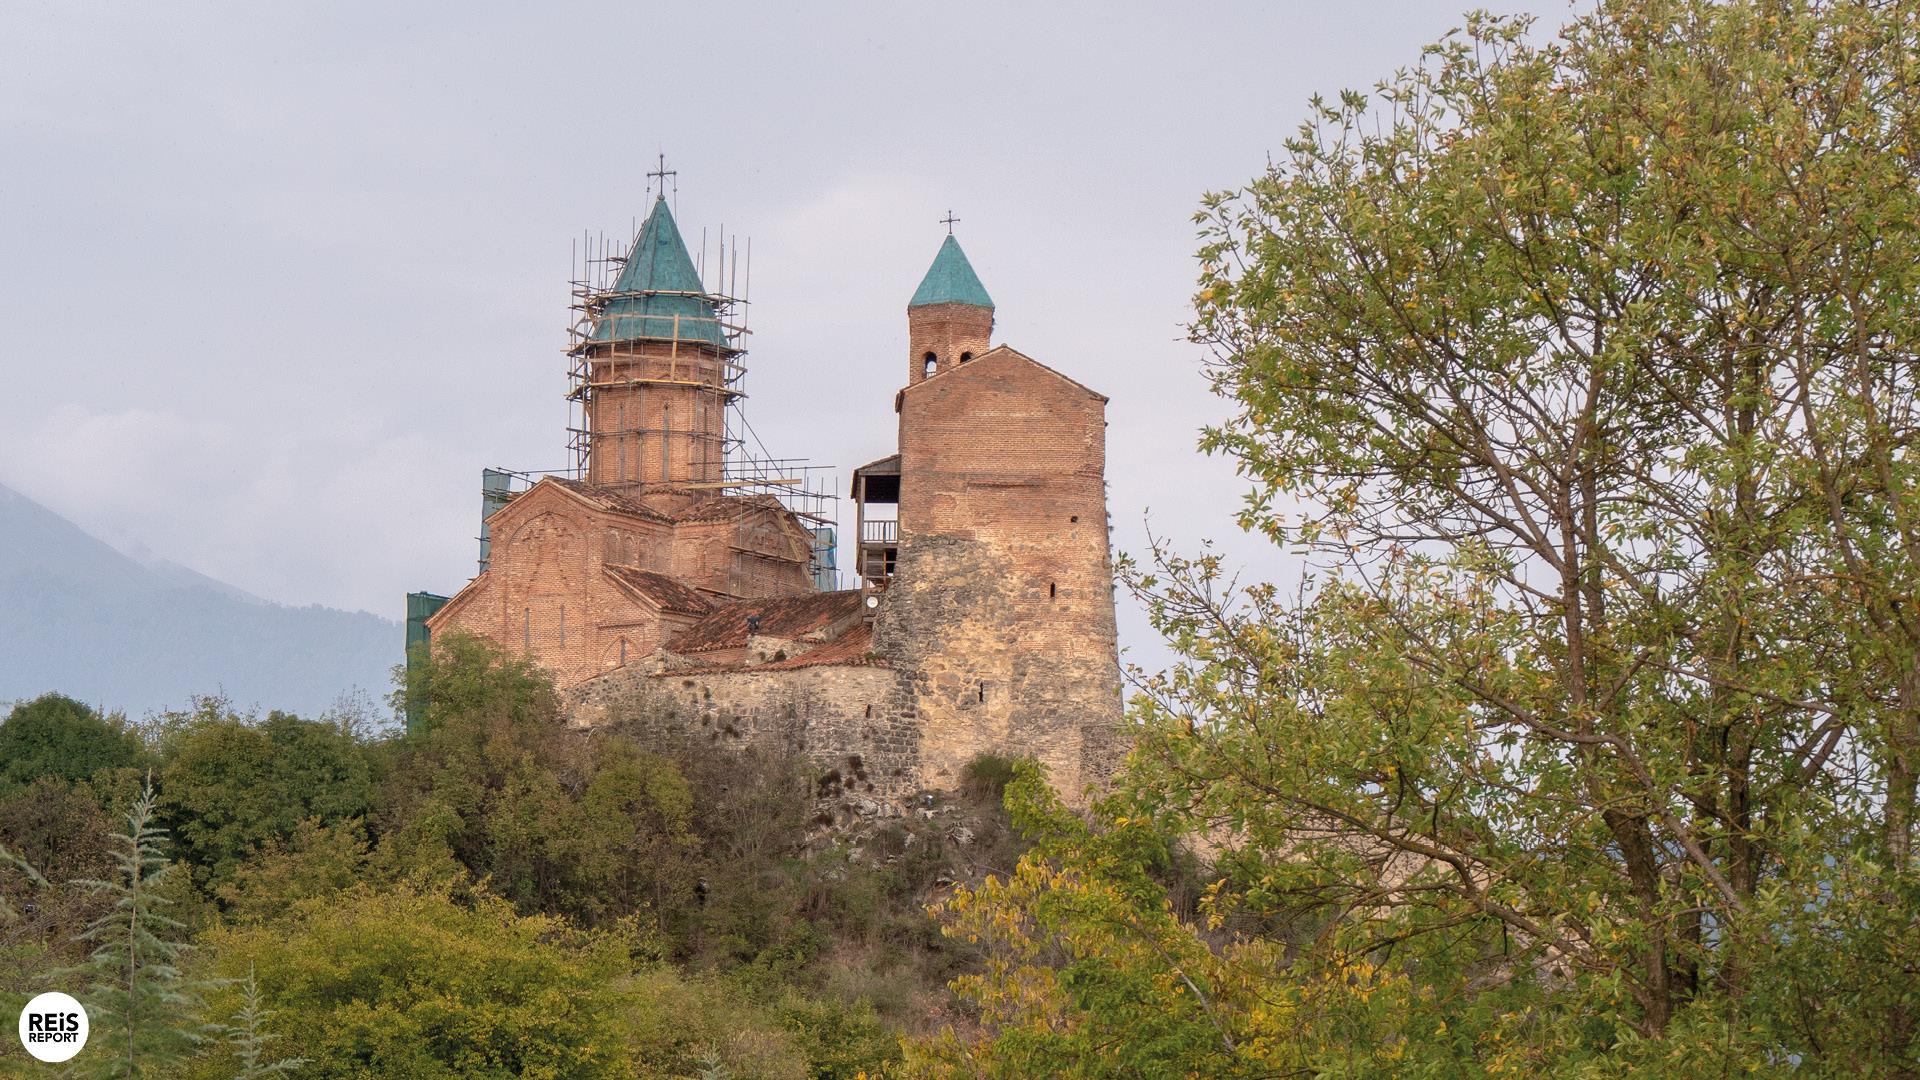 gremi-klooster-georgie